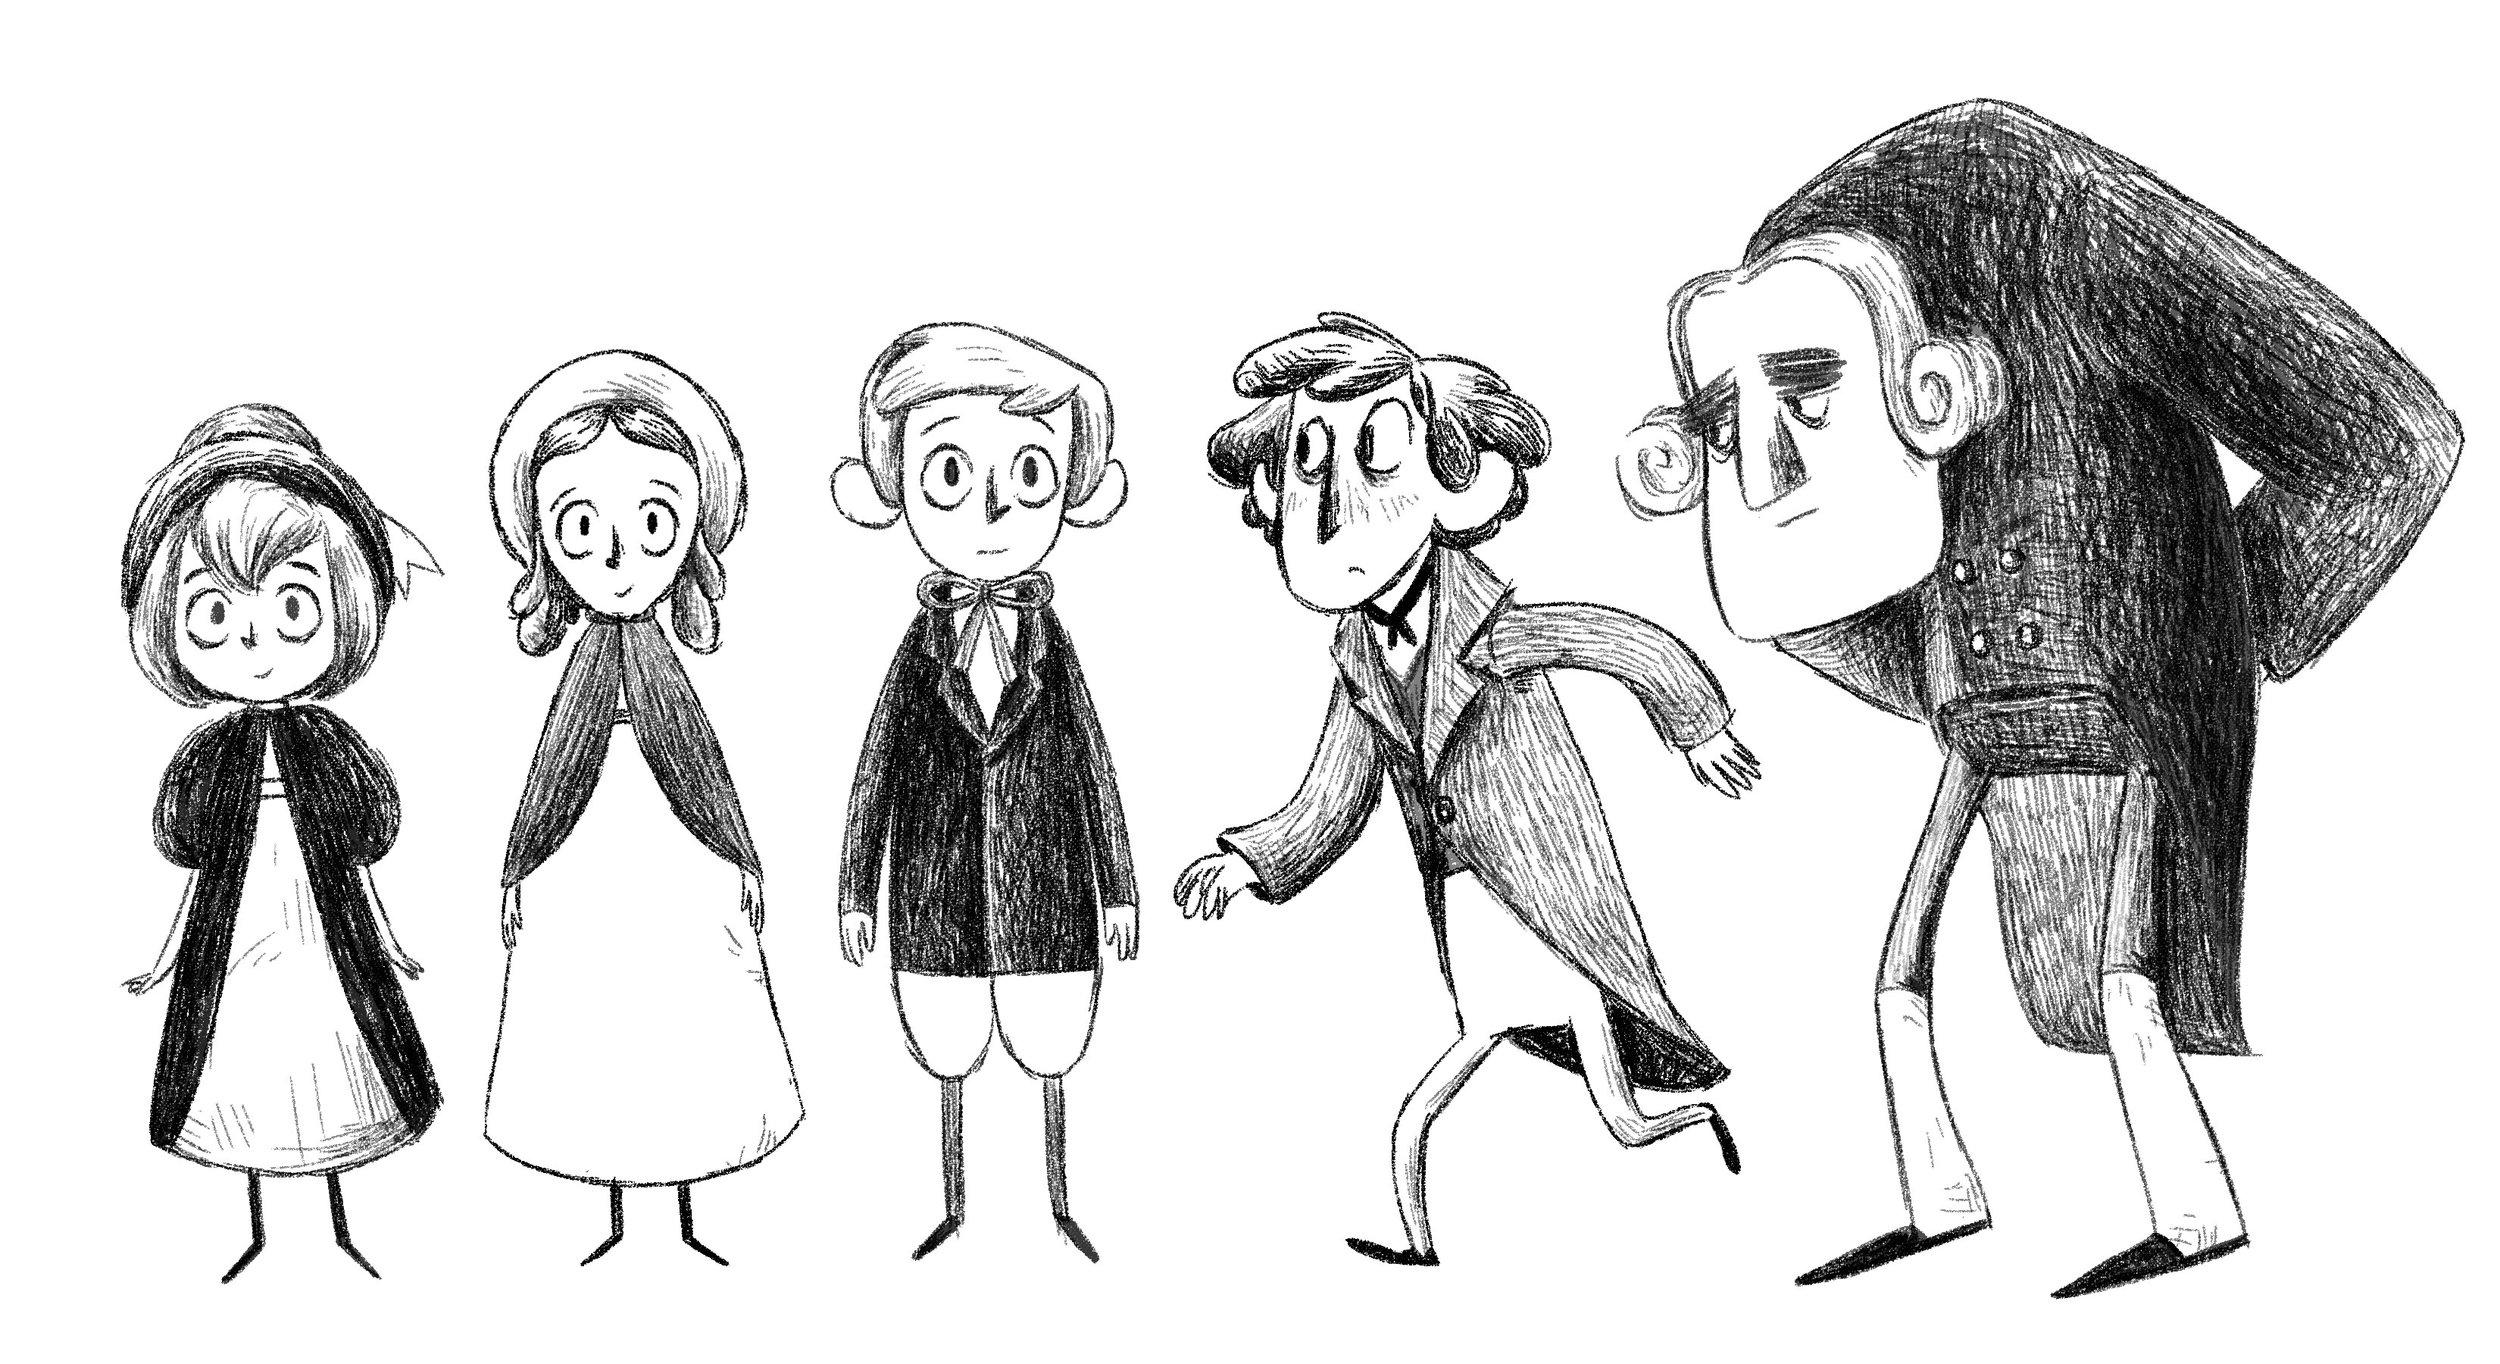 Illustration by Jessica Tai